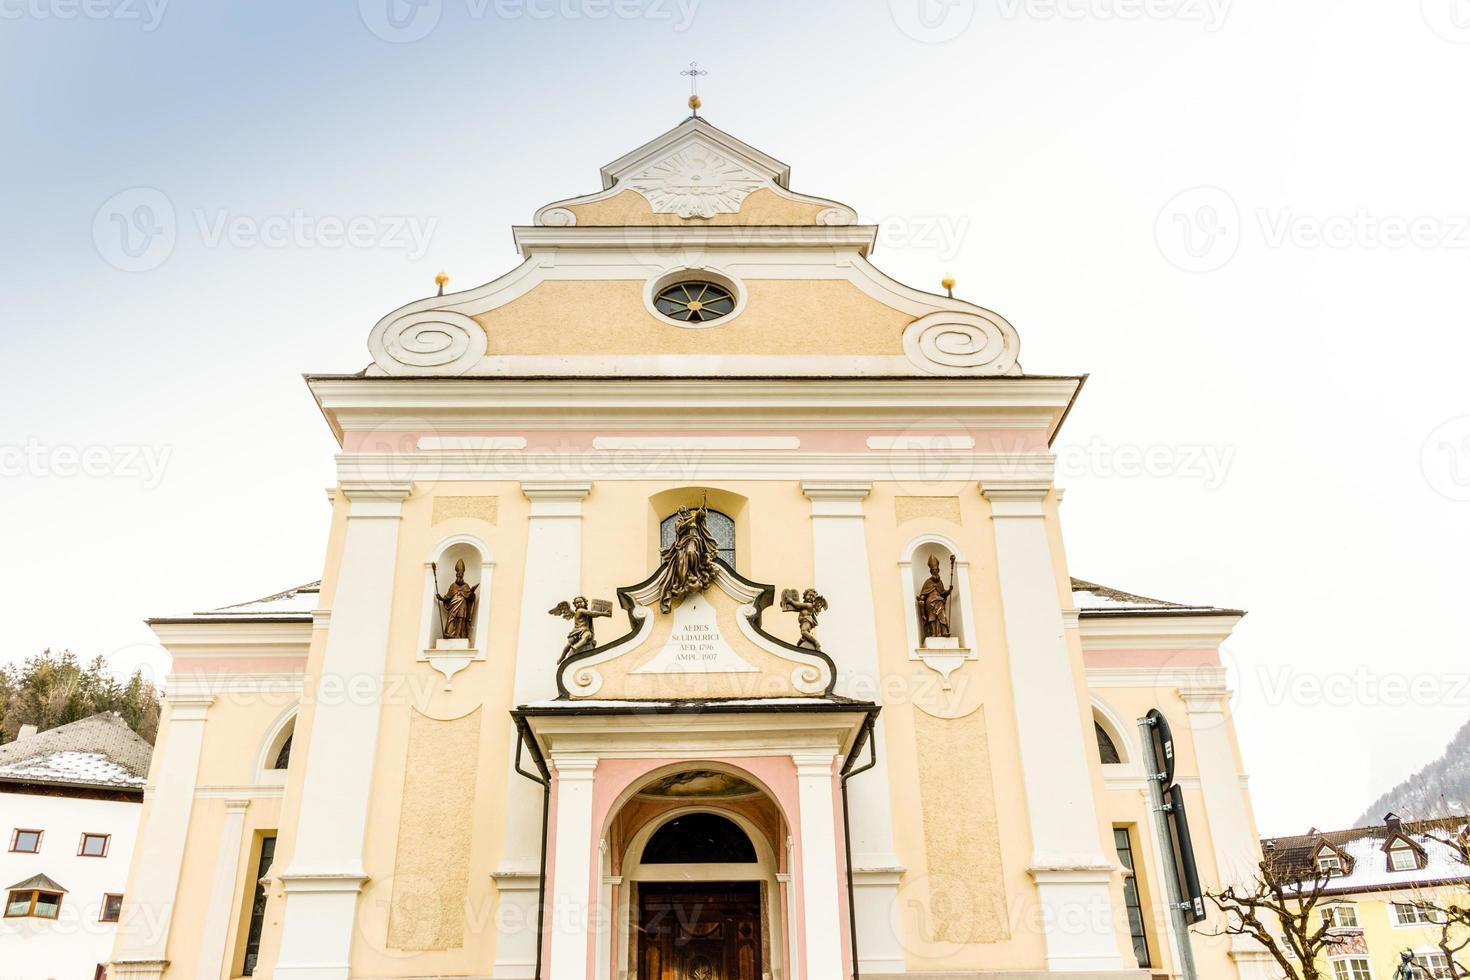 Facade of Catholic Parish Church in Dolomites photo